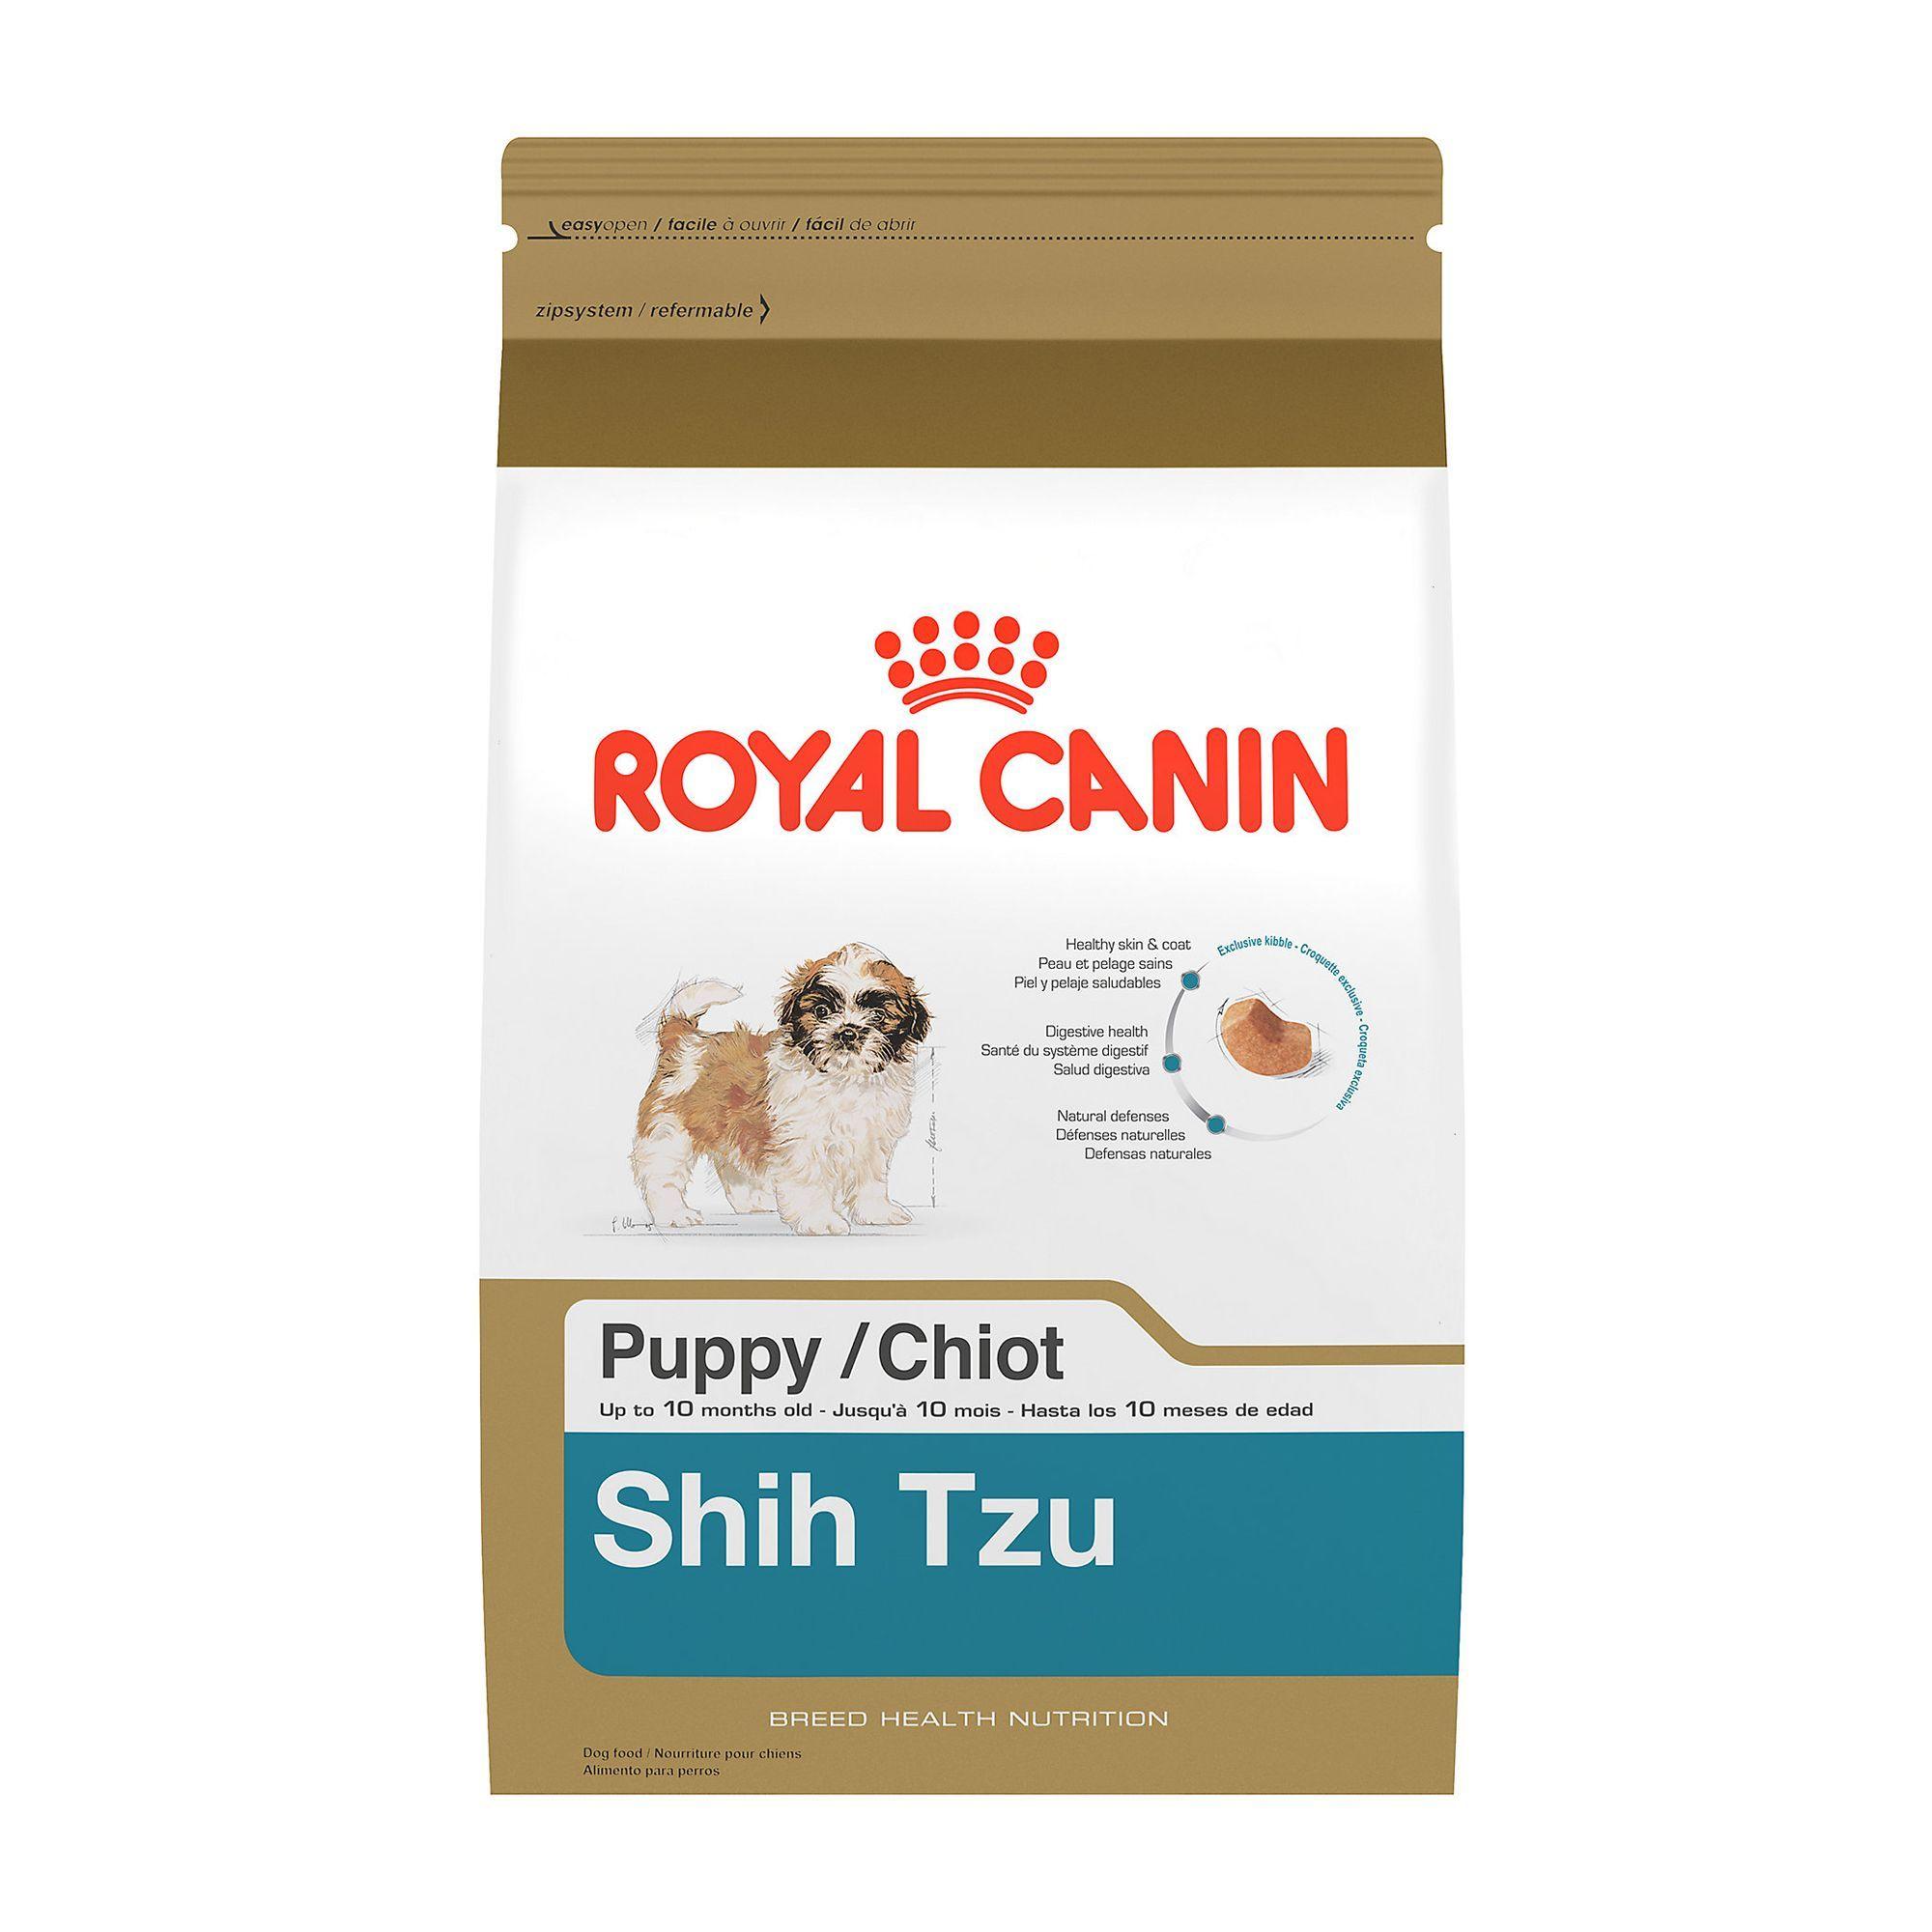 Royal Canin Breed Health Nutrition Shih Tzu Puppy Food Size 2 5